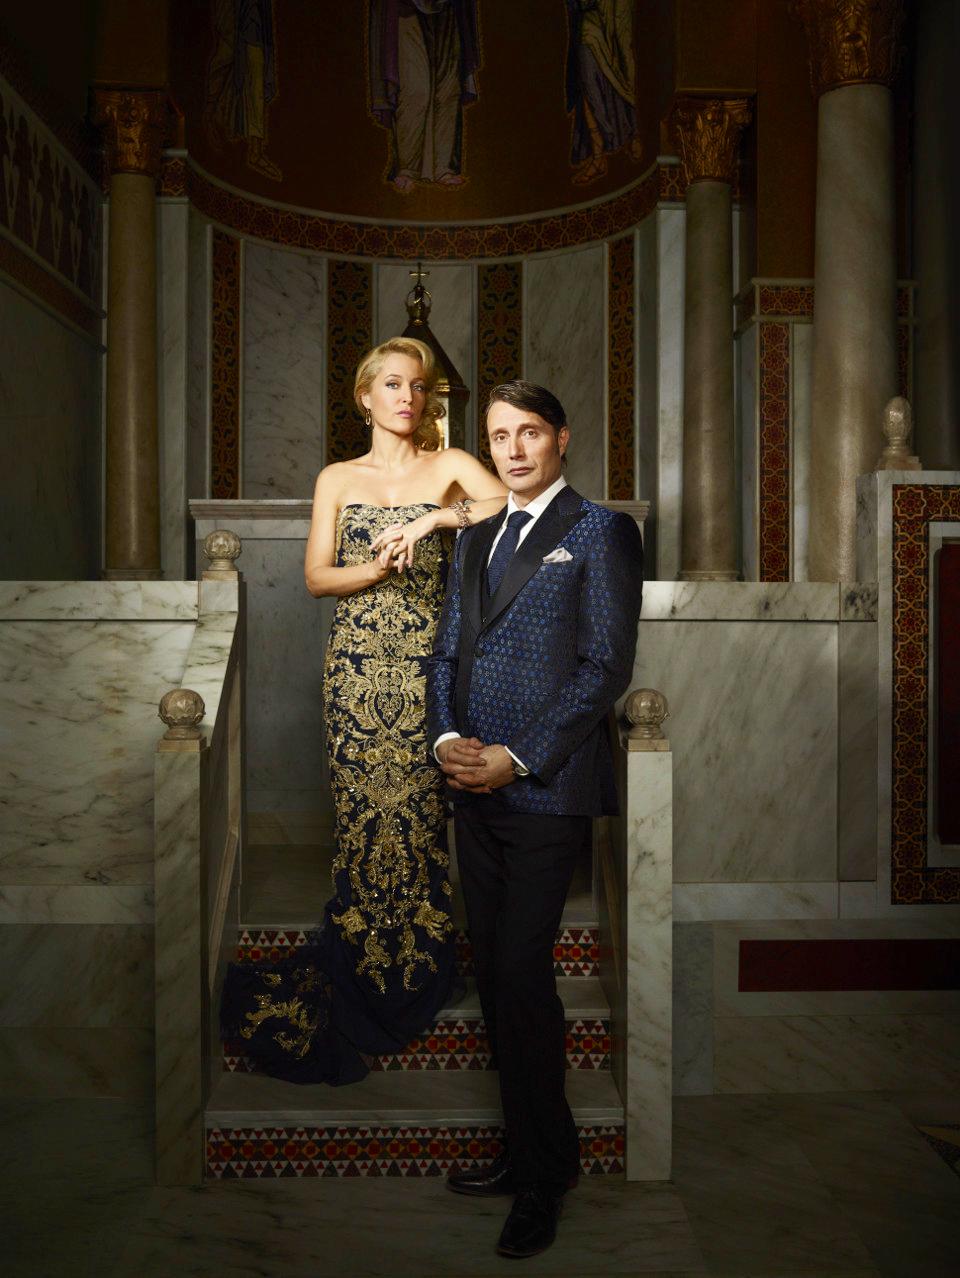 Hannibal-Season-3-Bedelia-and-Hannibal-2.jpg